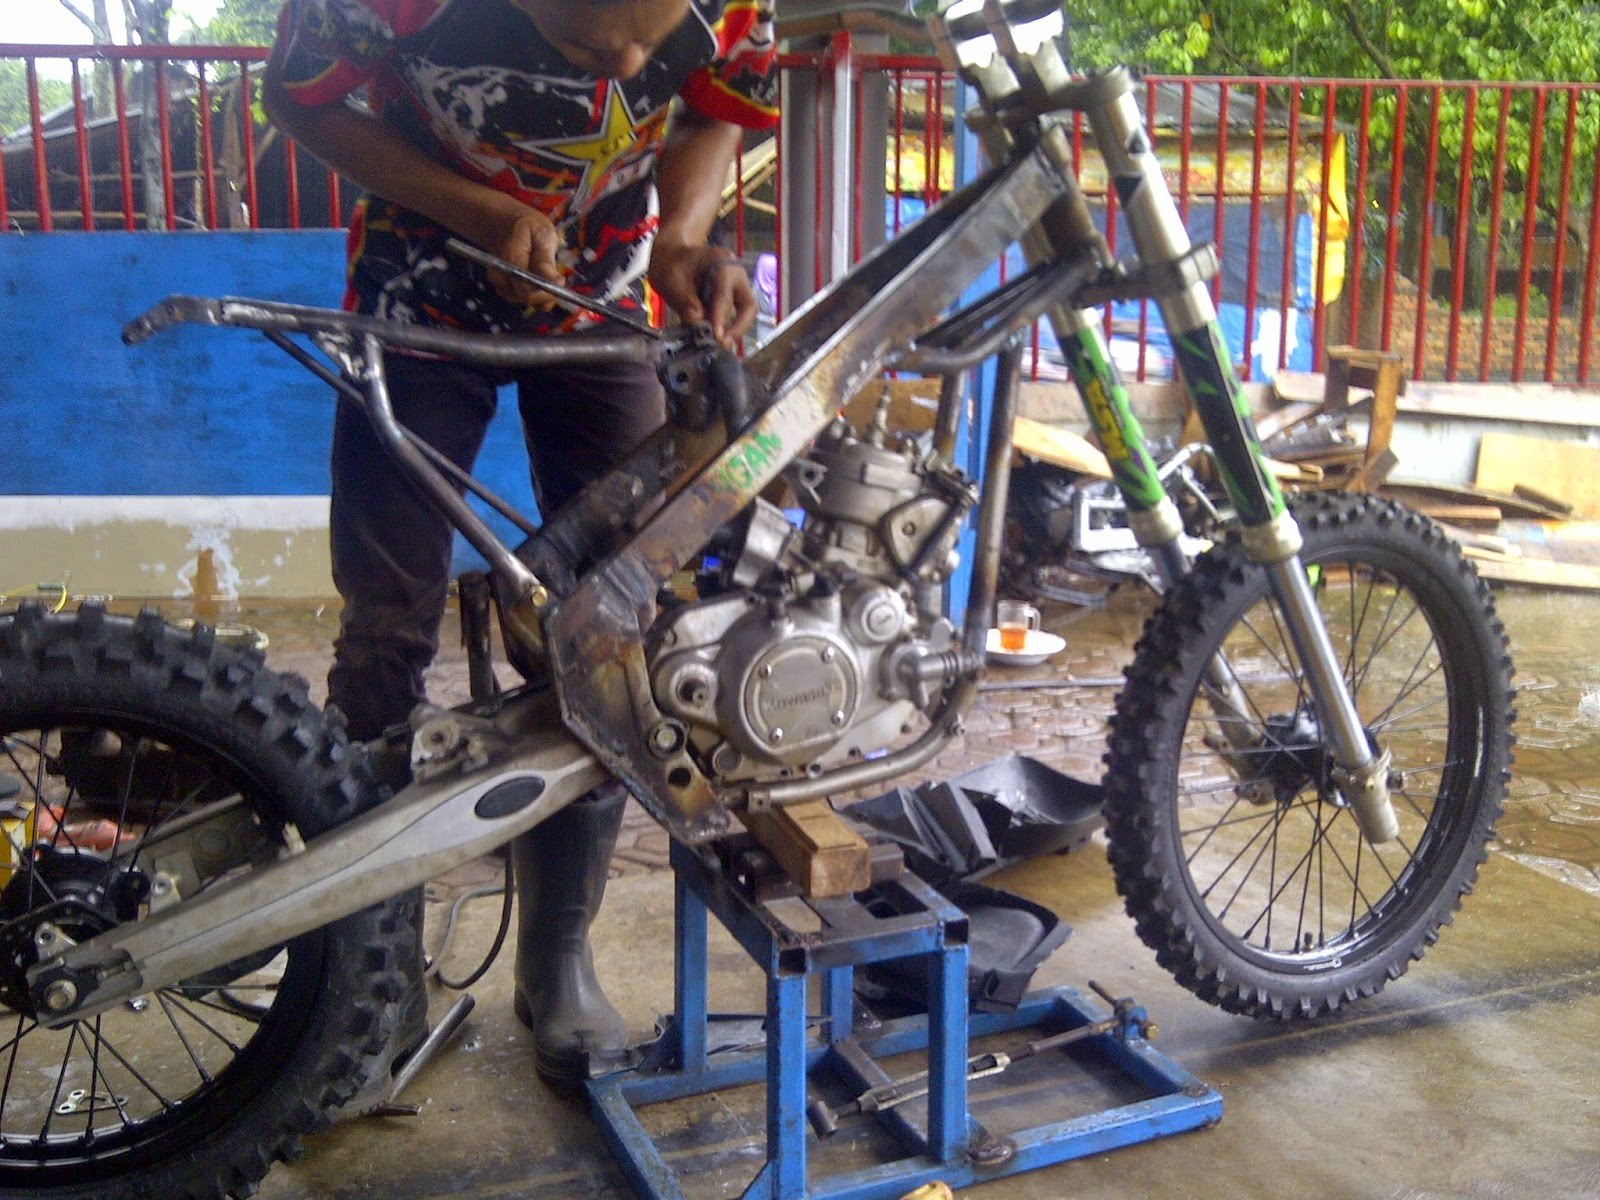 Modif Rangka Ninja Trail 150 R Grasstrack Modifikasi Motor Trabas